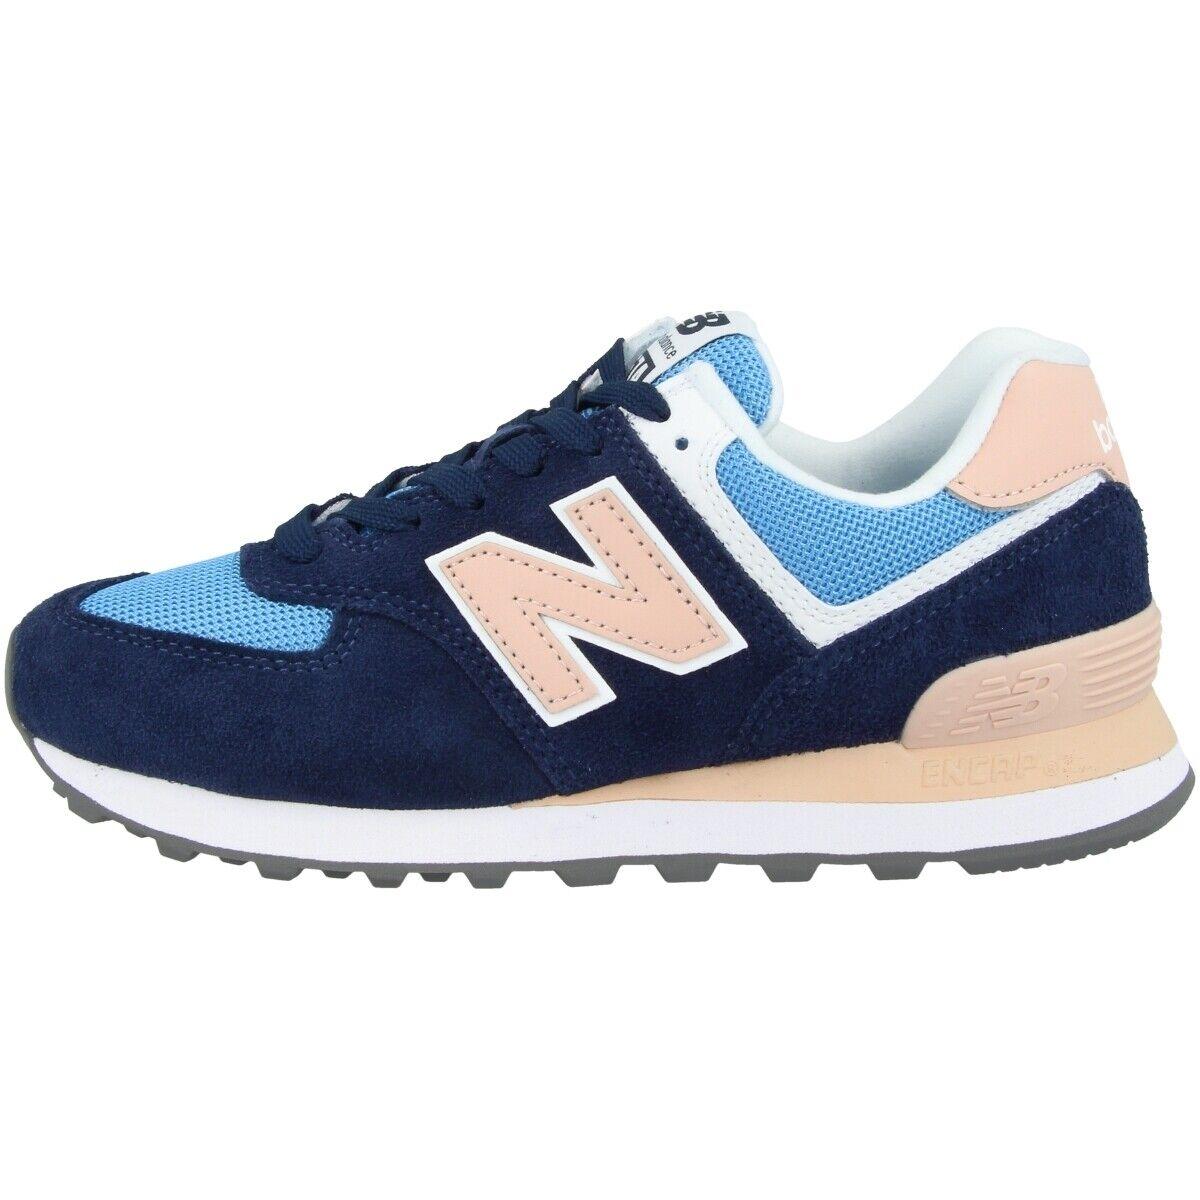 New Balance WL 574 WND Schuhe Damen Sport Turnschuhe Turnschuhe pigment WL574WND